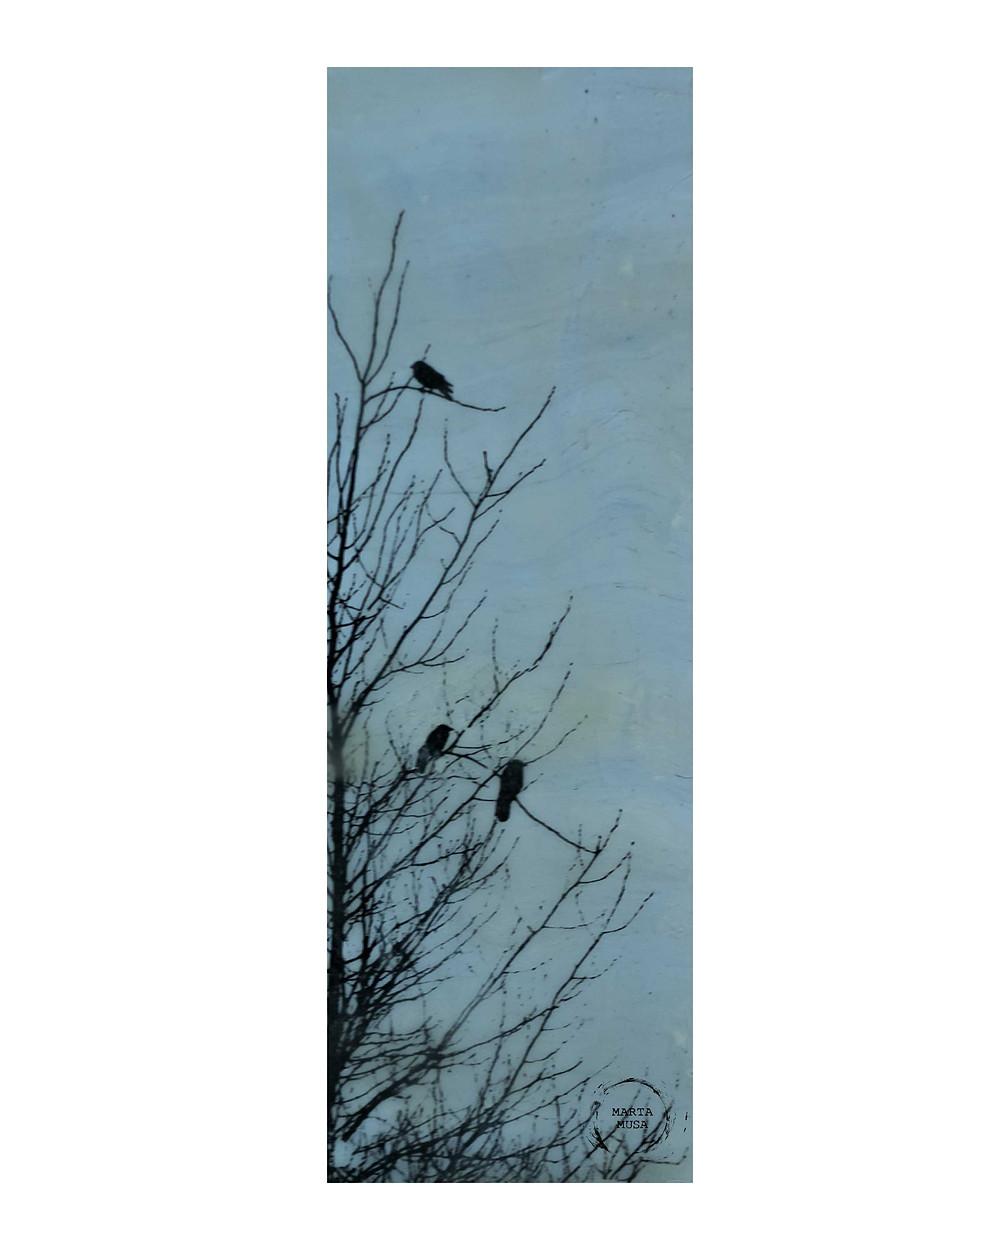 Crows of Still Creek 4 x 10 - $50